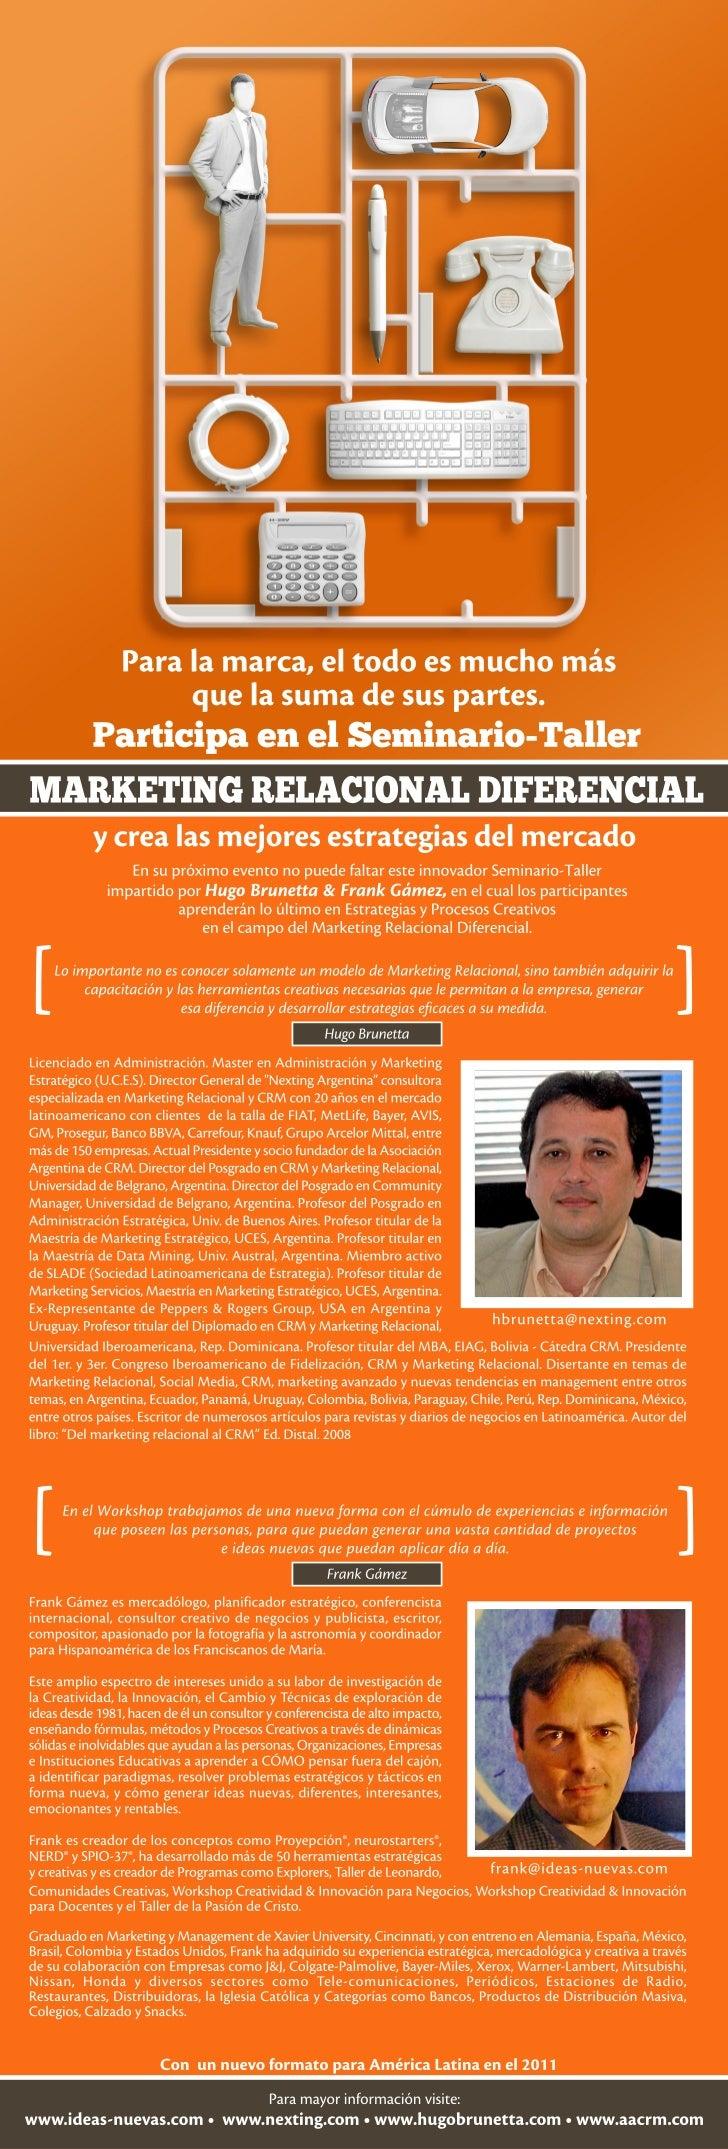 Marketing Relacional Diferencial